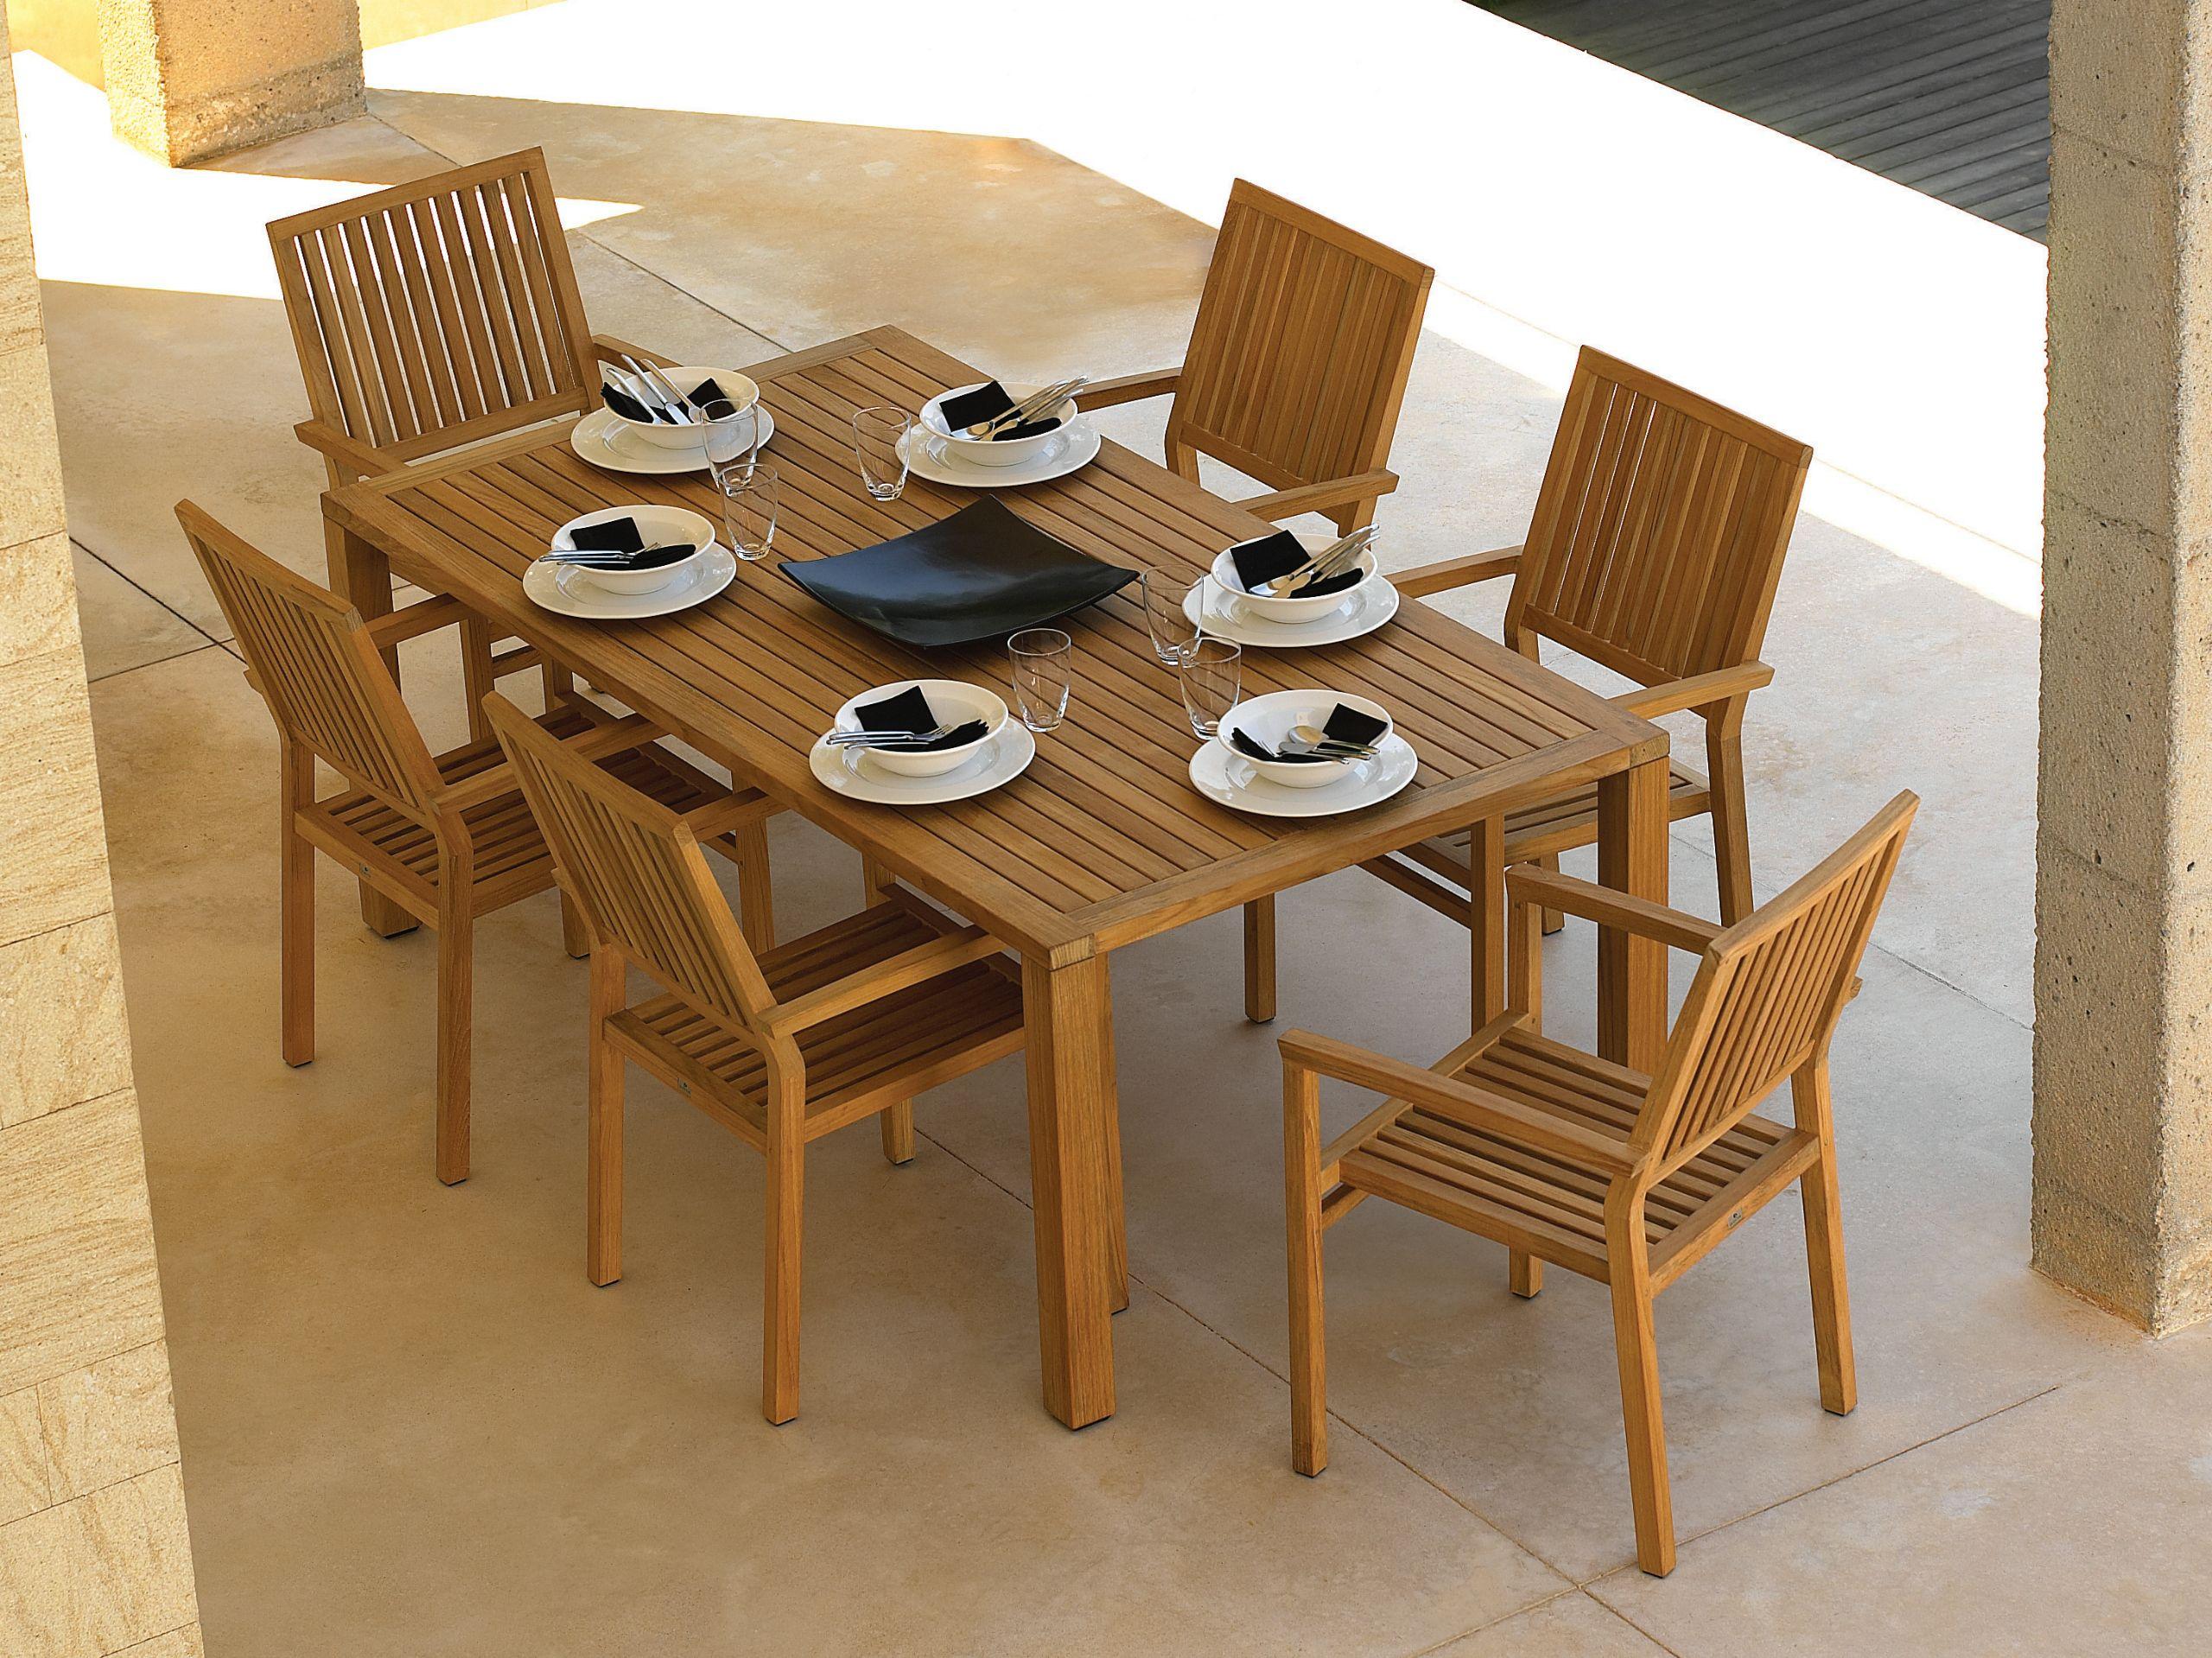 Square mesa de jard n rectangular by gloster dise o povl - Mesas de madera de jardin ...